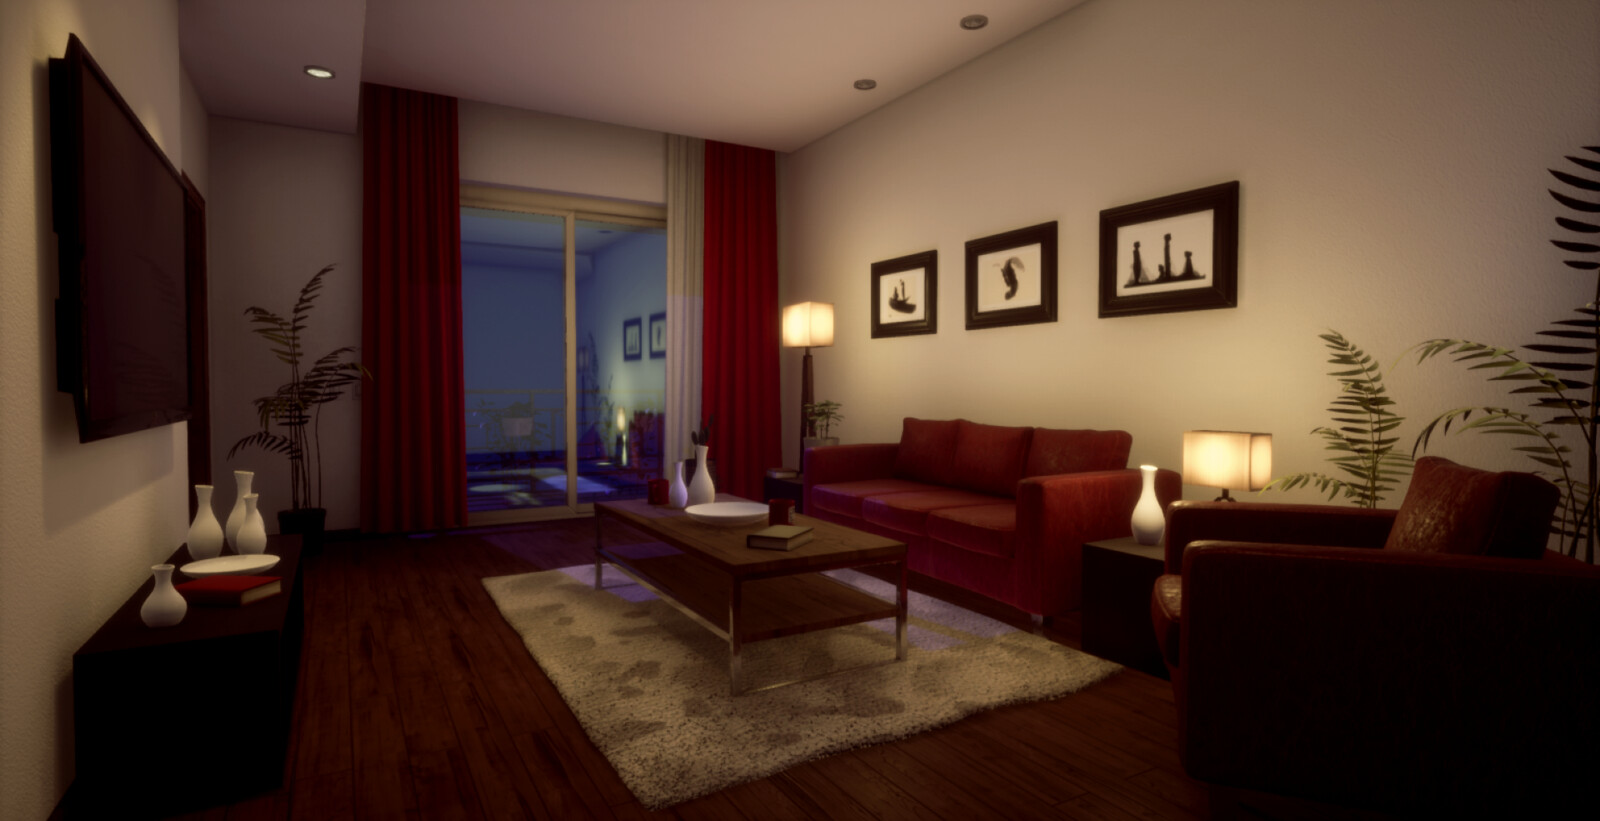 Cozy Home - Night